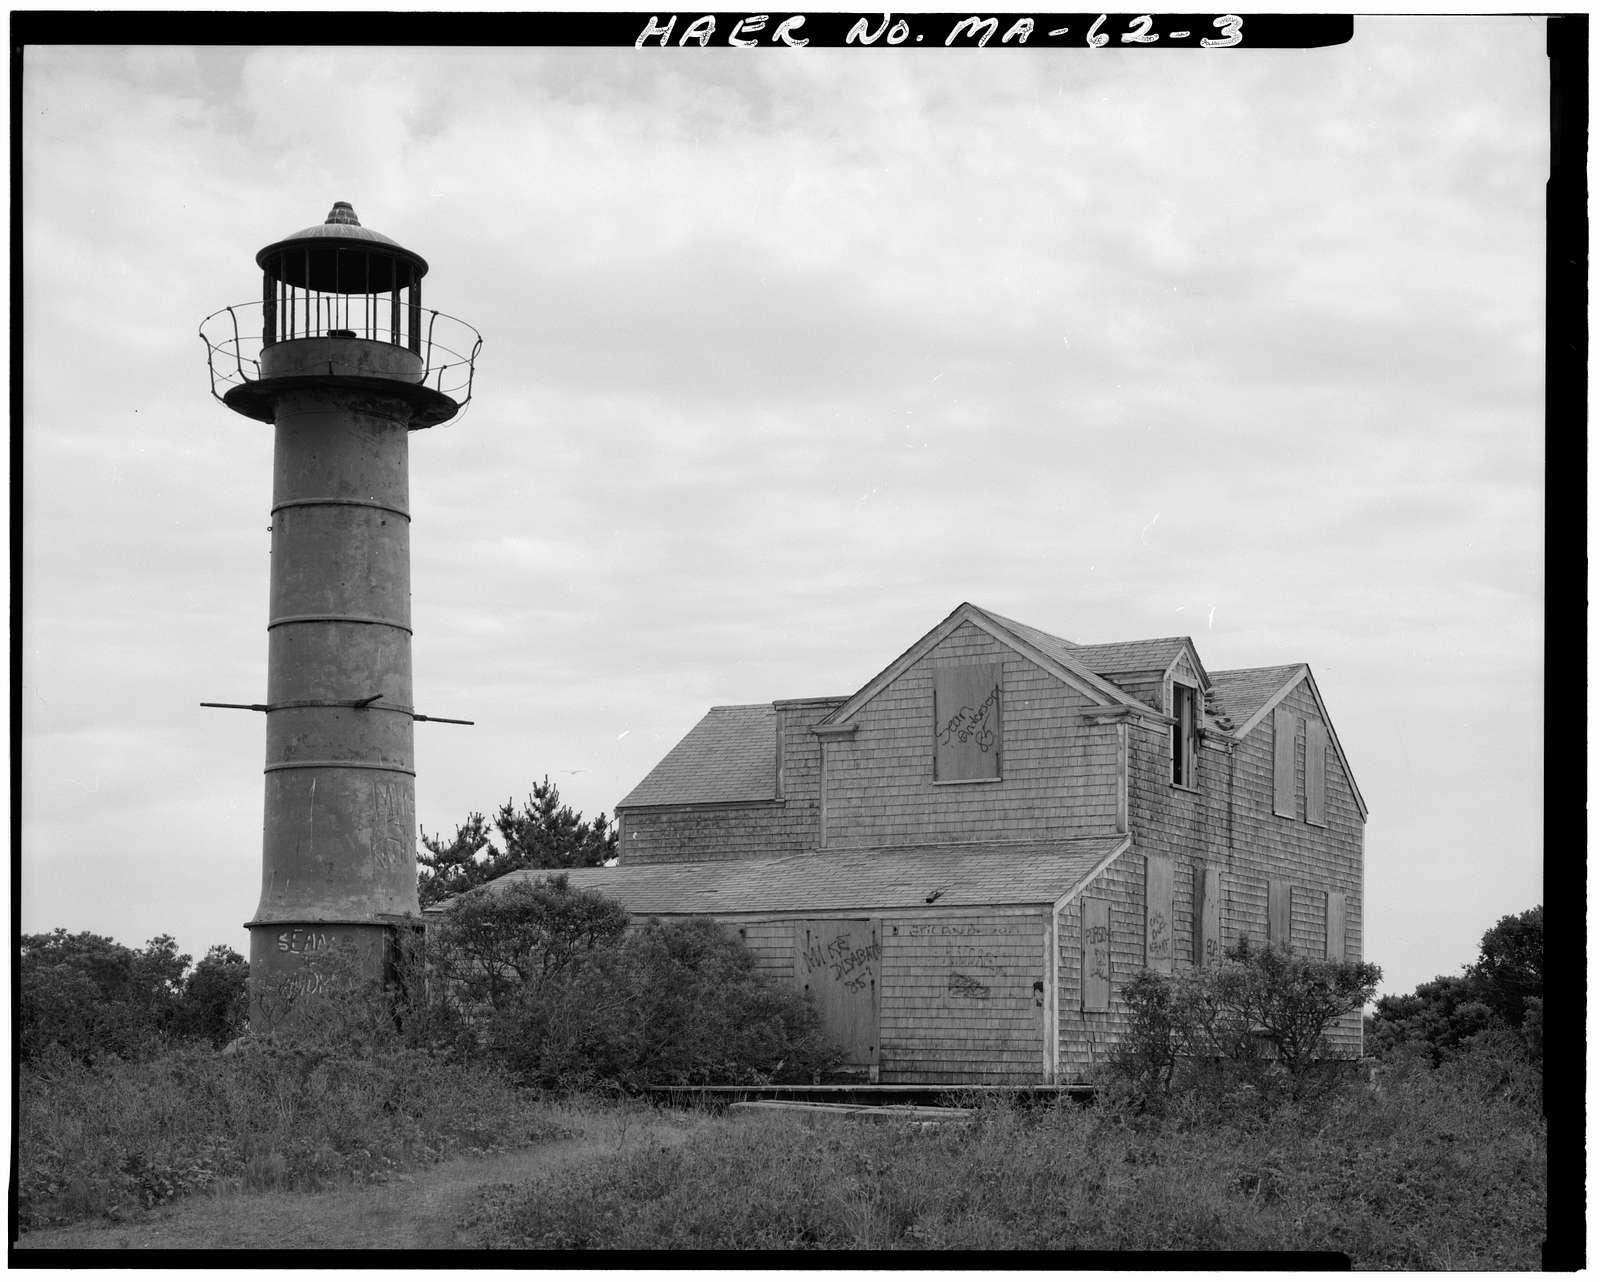 Monomoy Point Light Station, Approximately 3500 feet Northeast Powder Hole Pond, Monomoy National Wildlife Refuge, Chatham, Barnstable County, MA